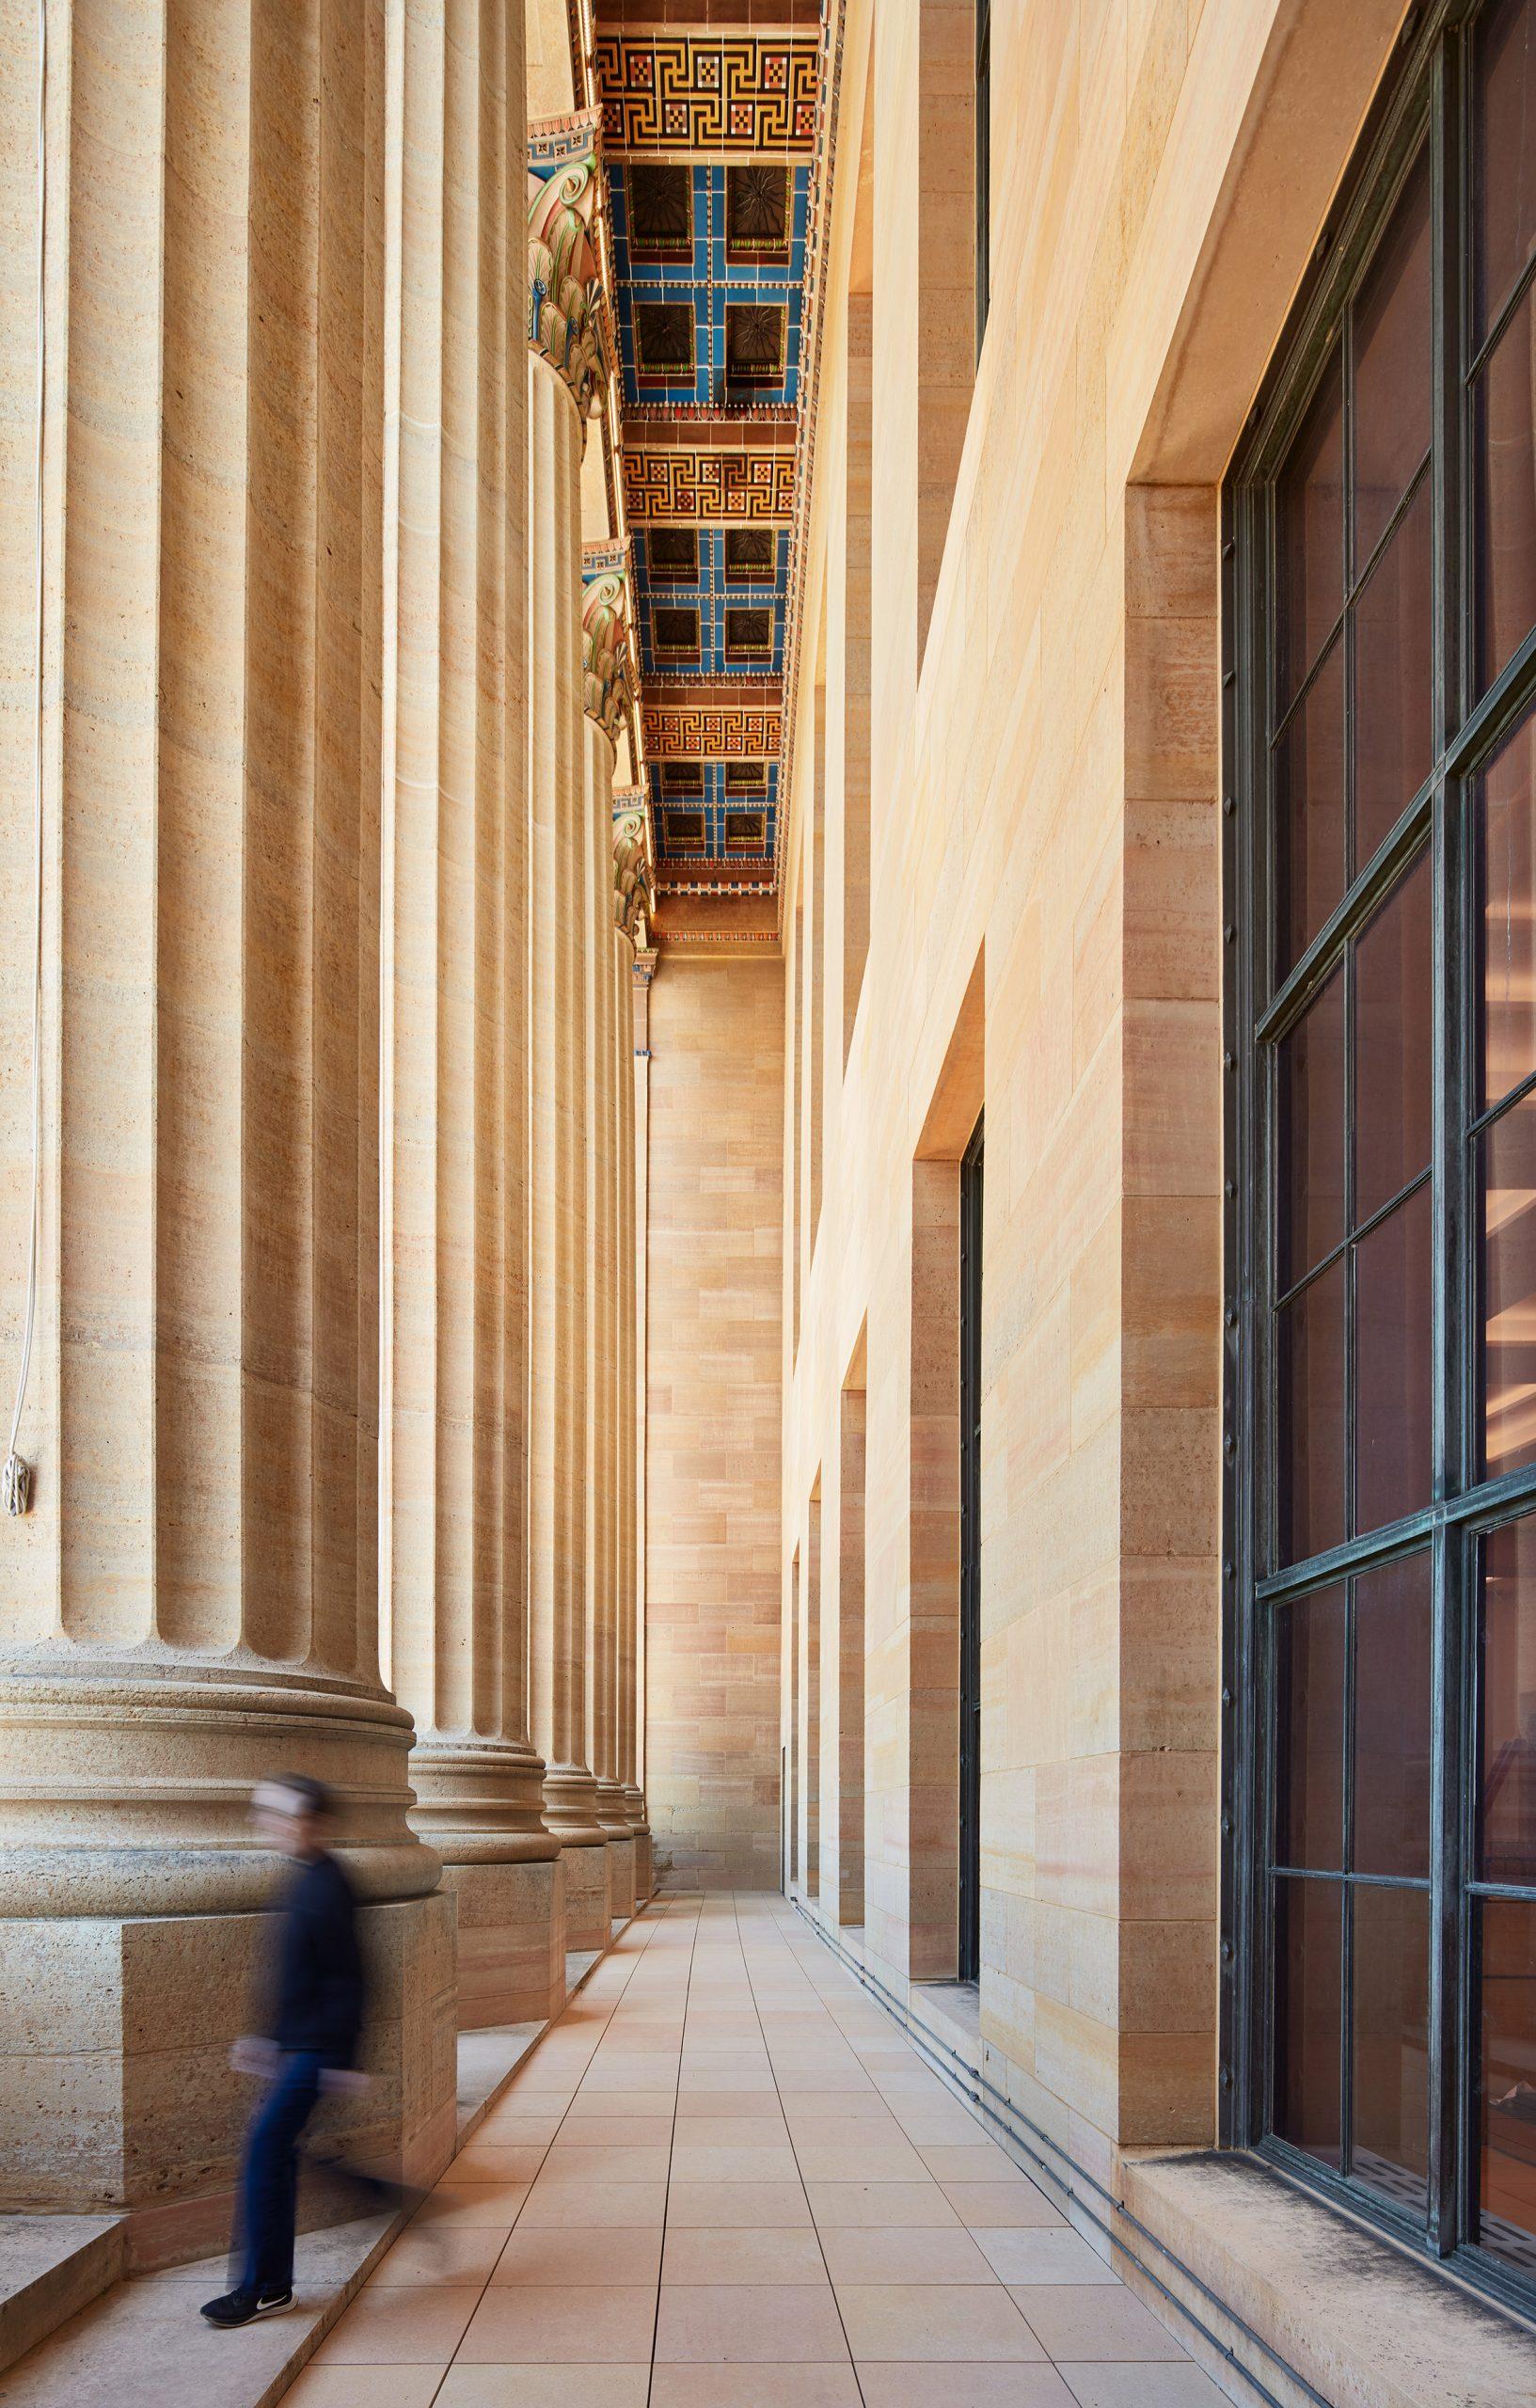 Vaulted Walkway of the Philadelphia Museum of Art